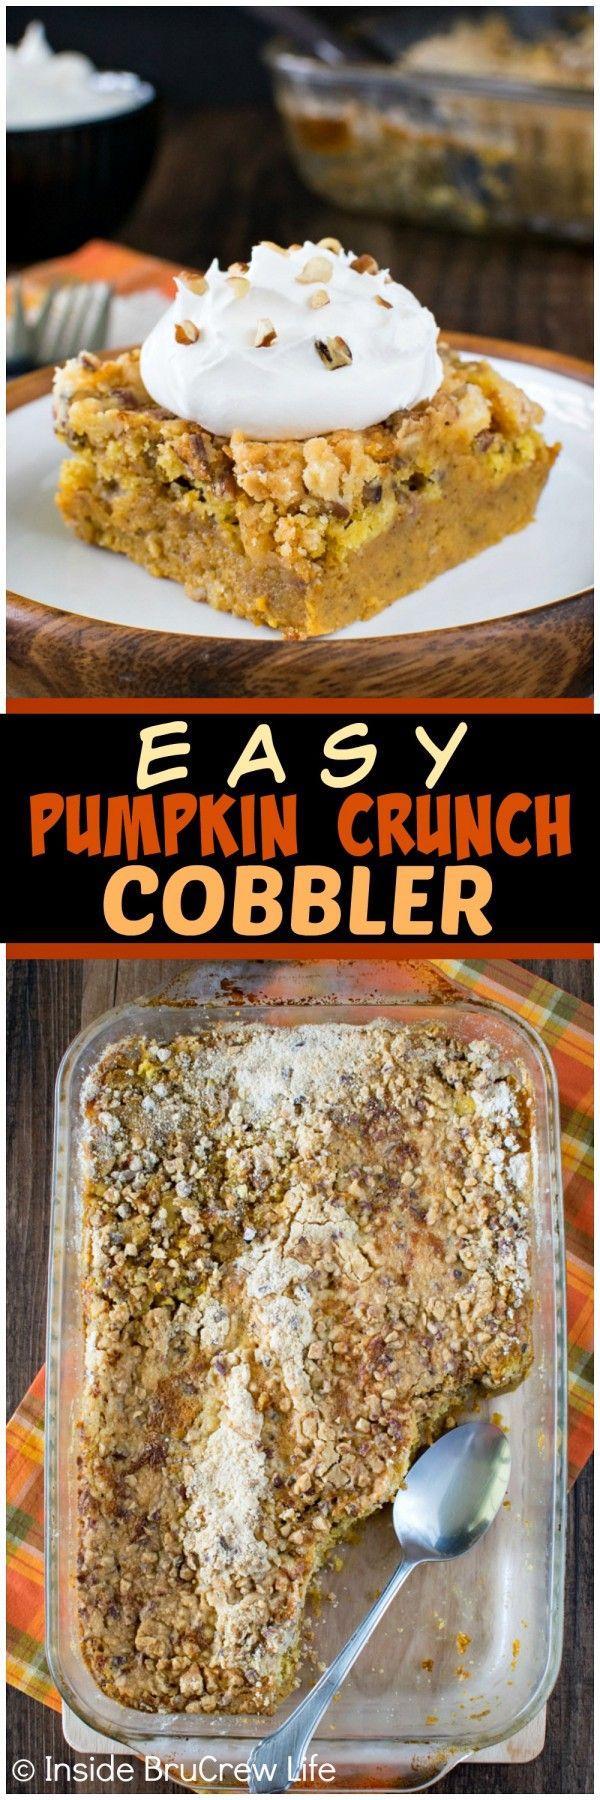 Easy Pumpkin Crunch Cobbler - a crunchy streusel topping and creamy pumpkin filling makes this dessert a great fall recipe! ~ Inside BruCrew Life